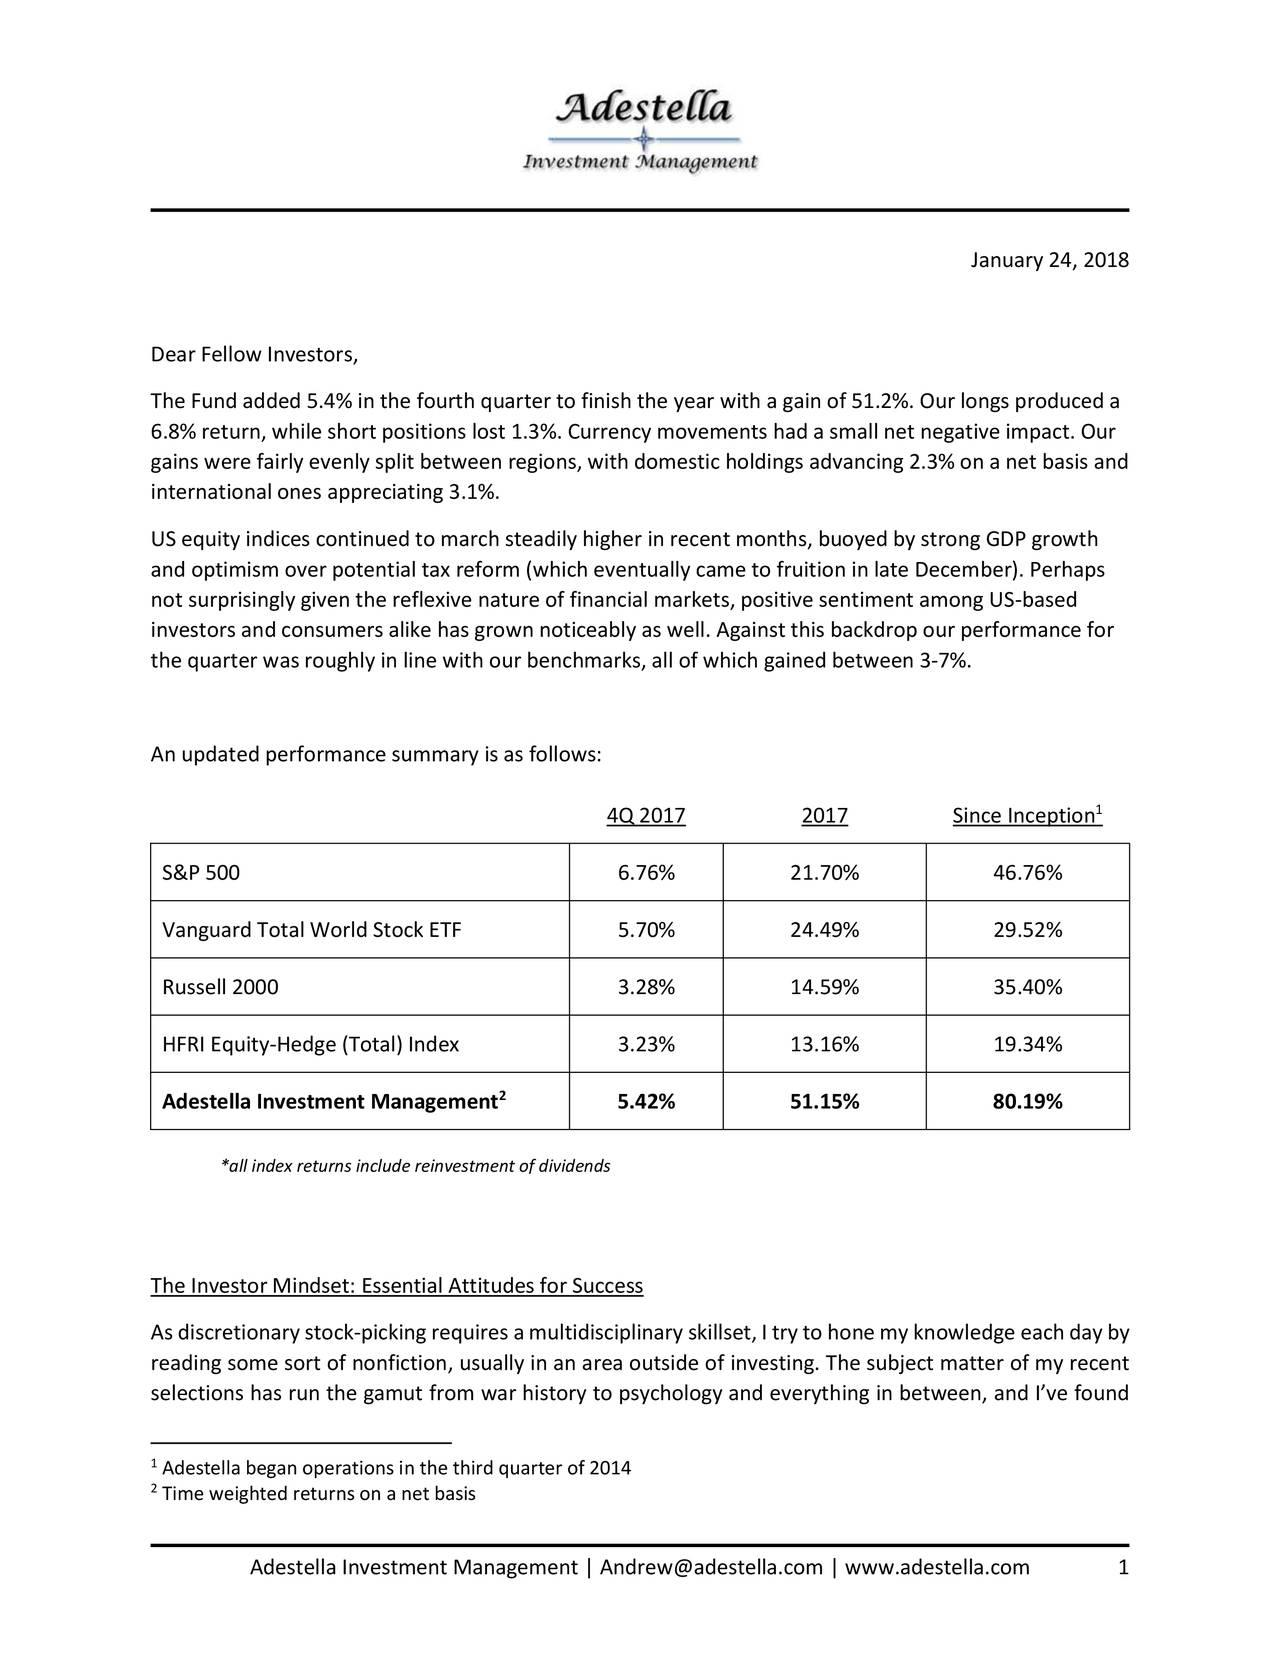 Adestella Investment Management Q  Investor Letter  Seeking Alpha